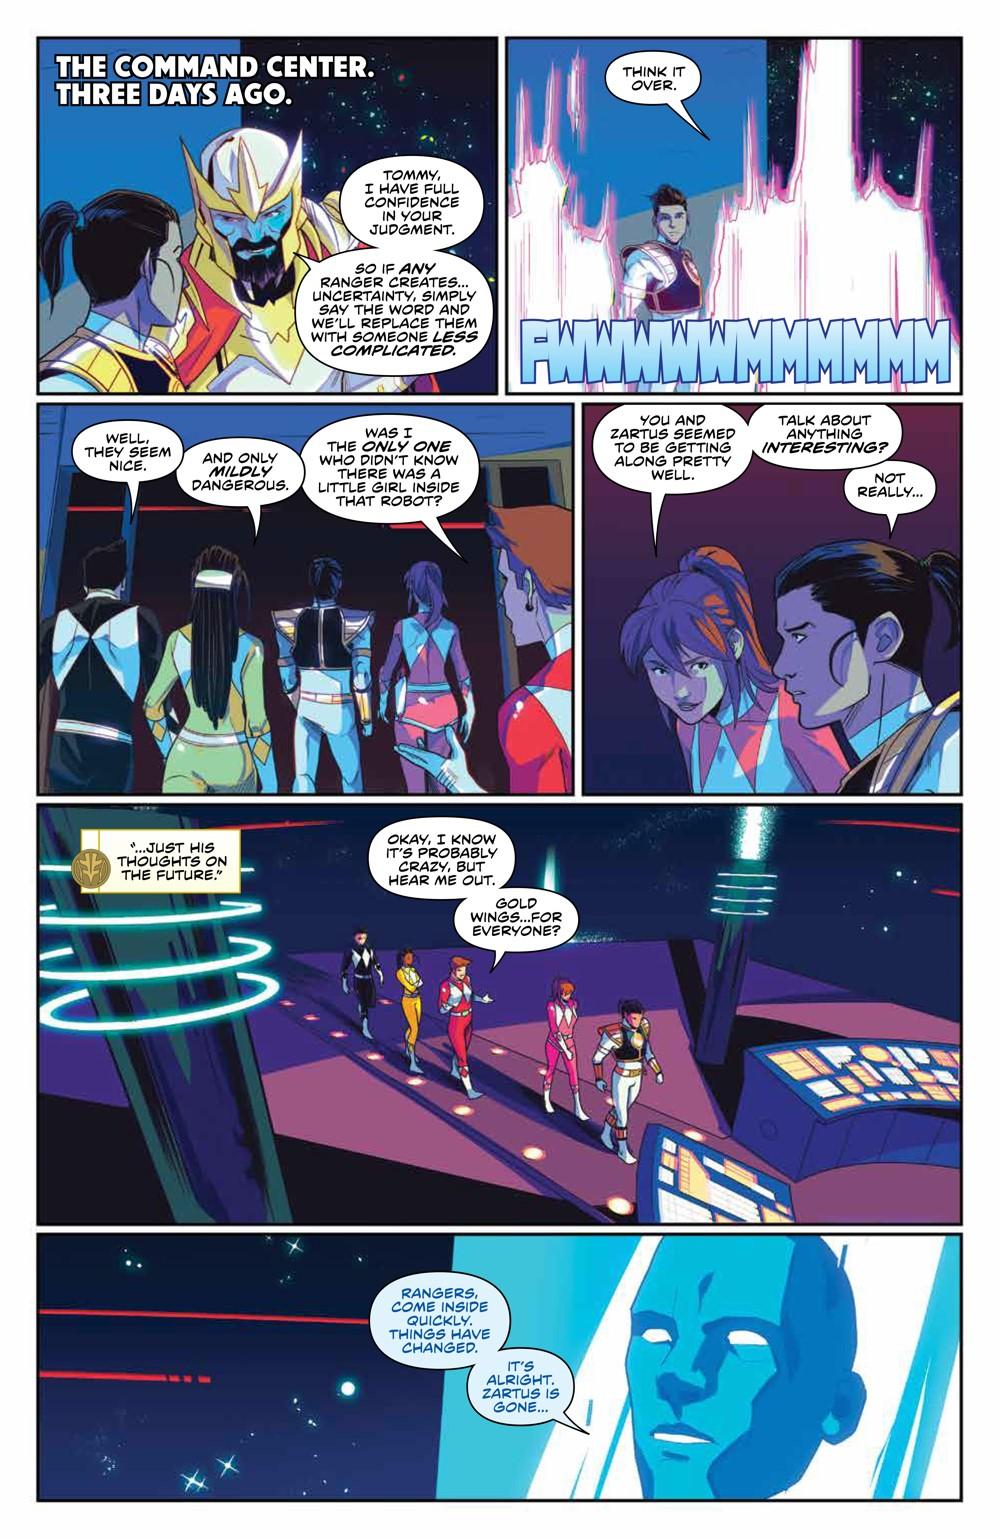 MightyMorphin_012_PRESS_6 ComicList Previews: MIGHTY MORPHIN #12